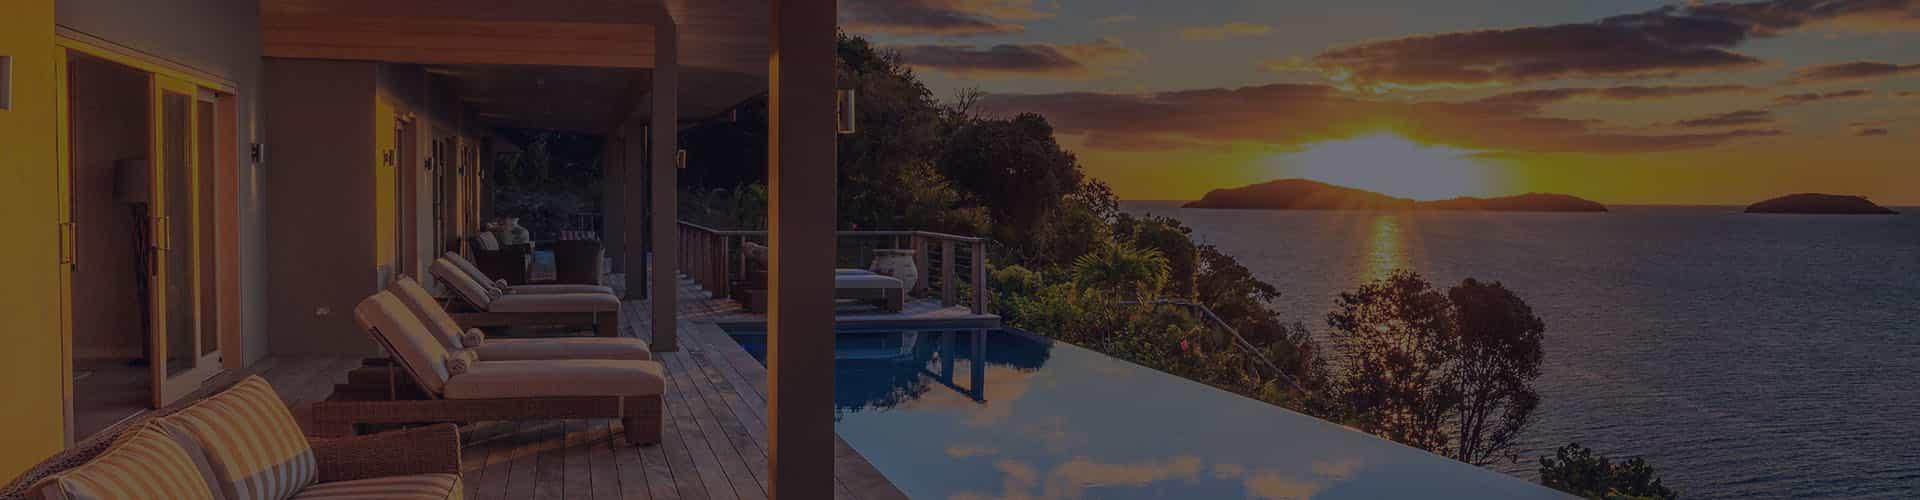 Красочный вид из дома на море и закат